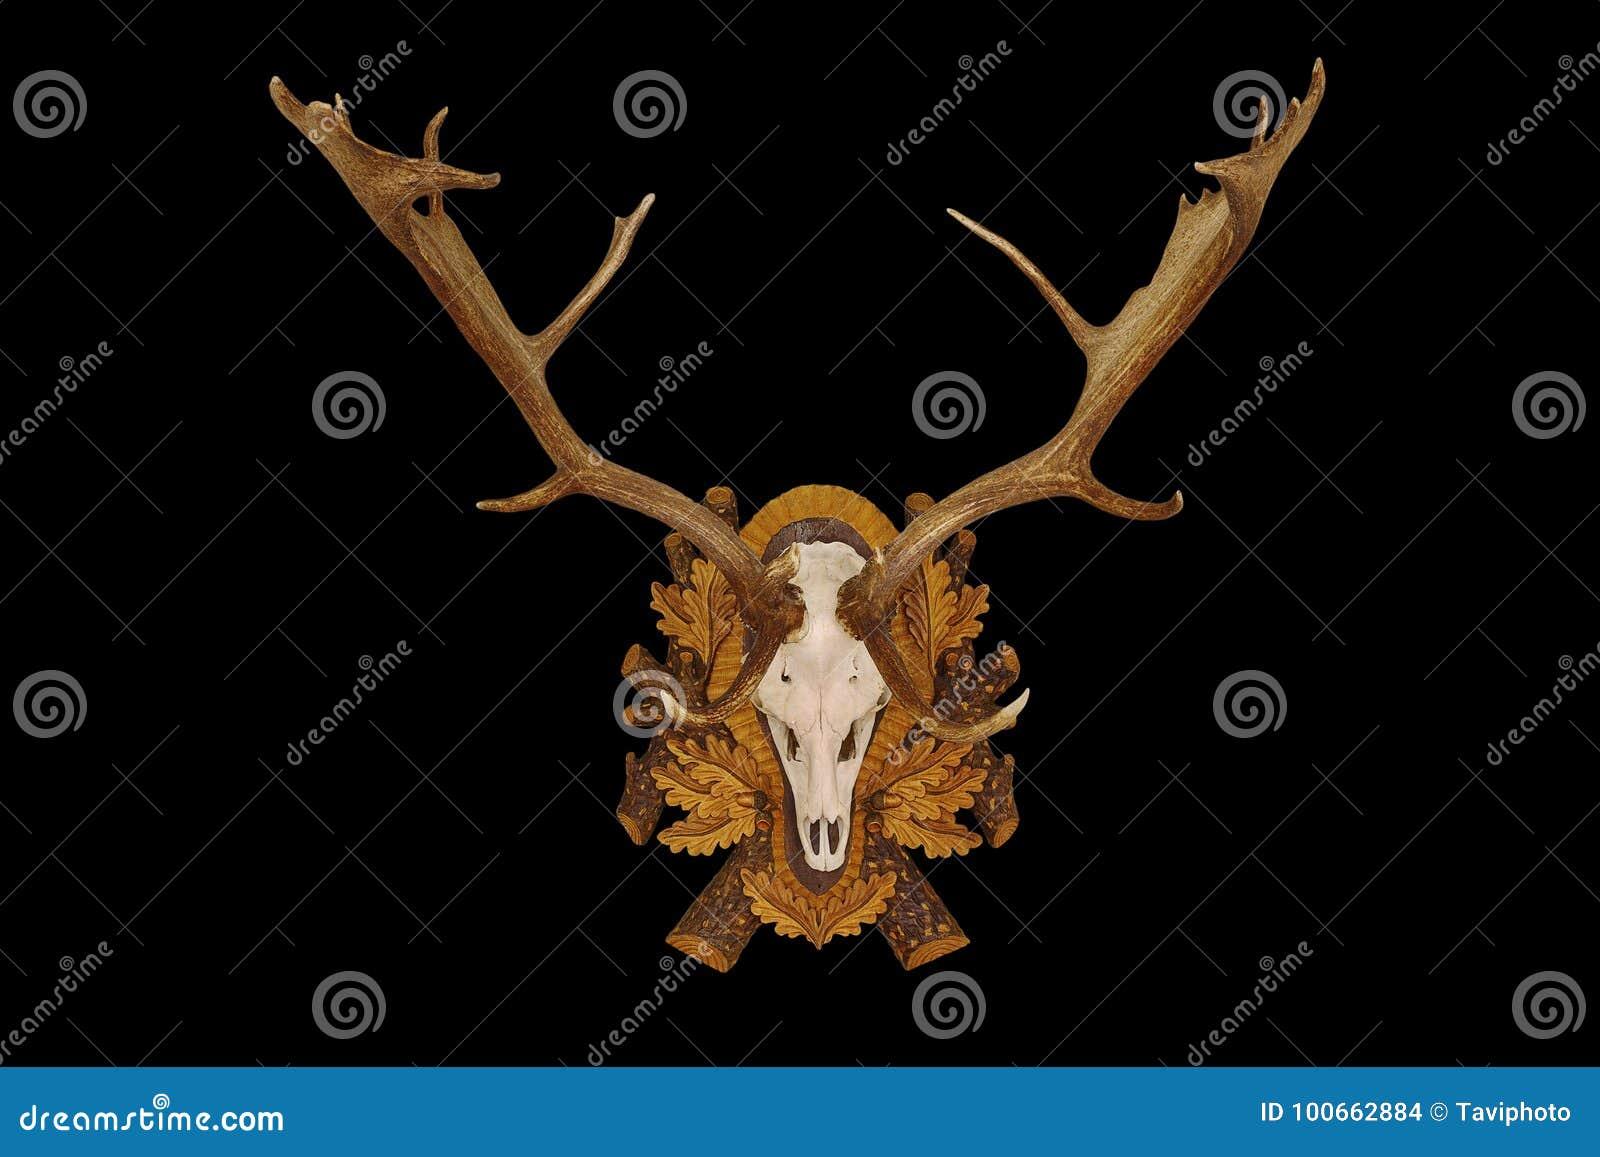 Beautiful fallow deer trophy over black background